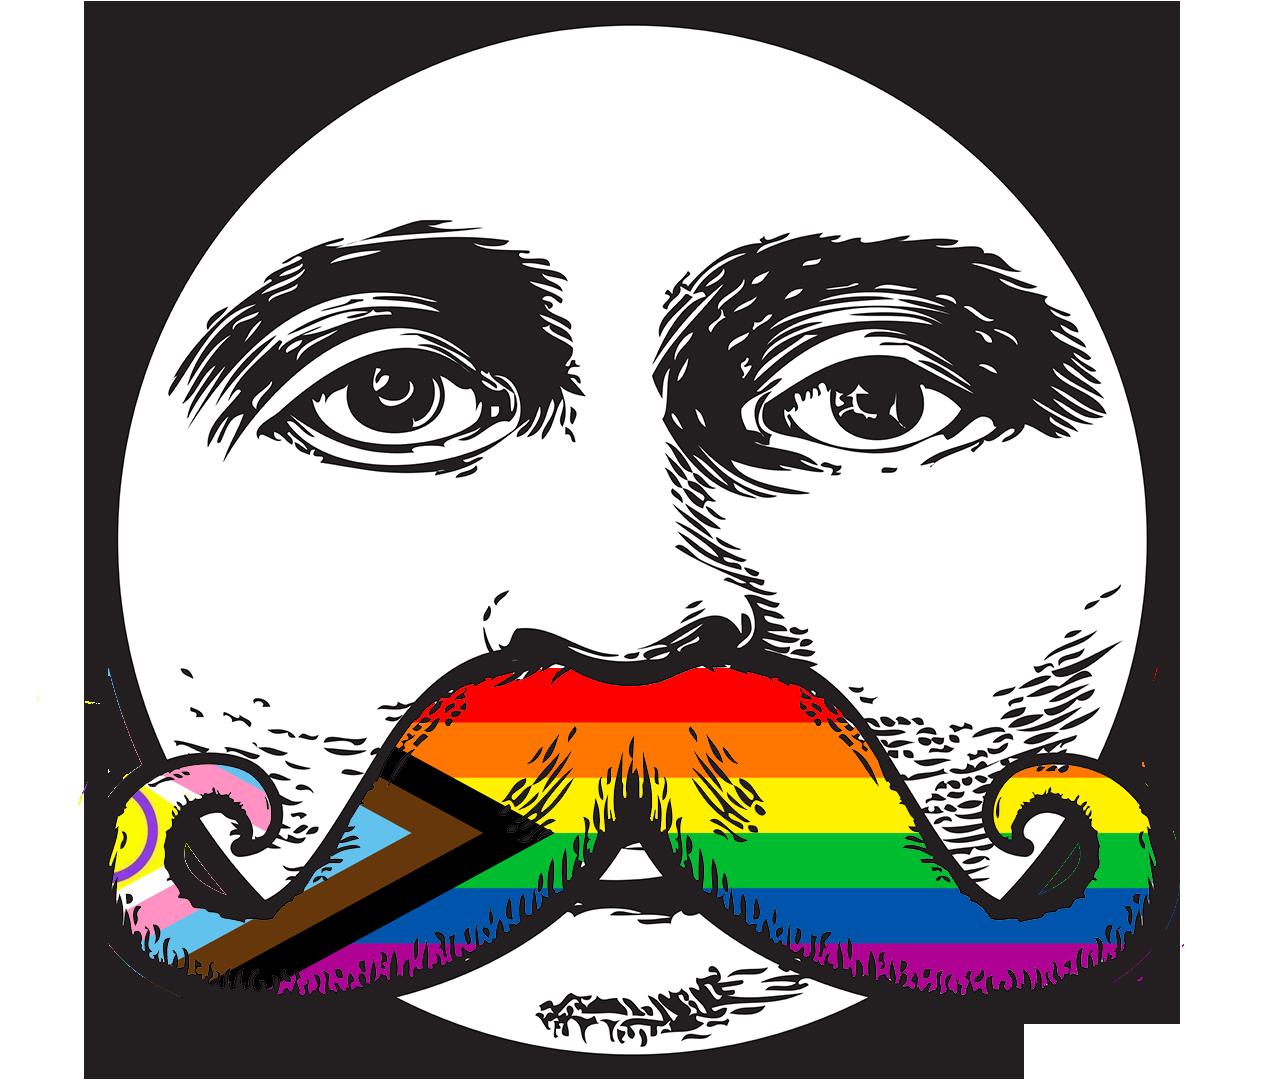 Rainbow-Moonstache-2021